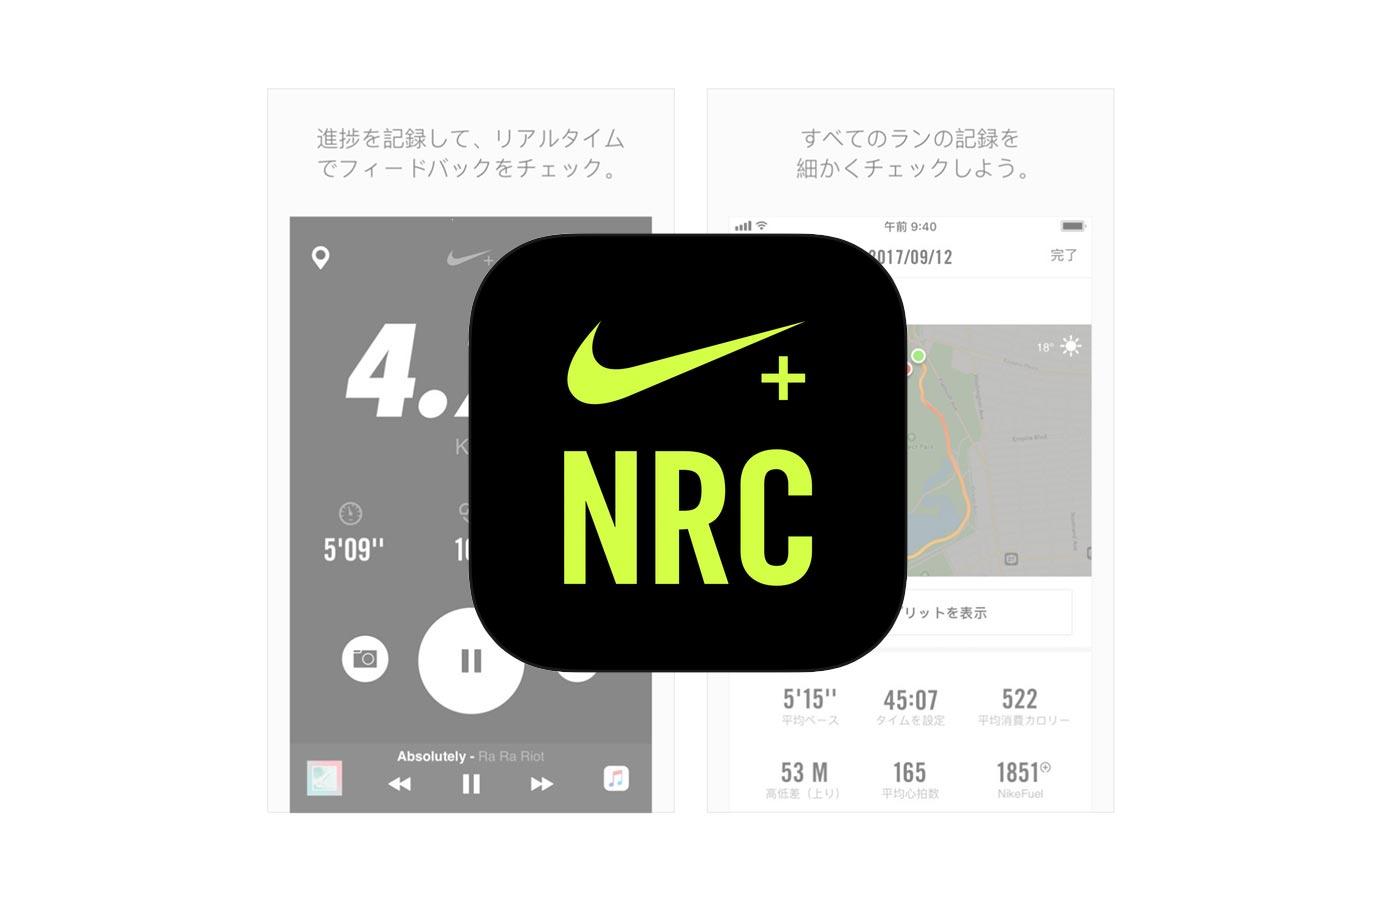 NIKE、Apple Watch Series 3の高度計測機能に対応するなどしたiOSアプリ「Nike+ Run Club 5.9.0」リリース